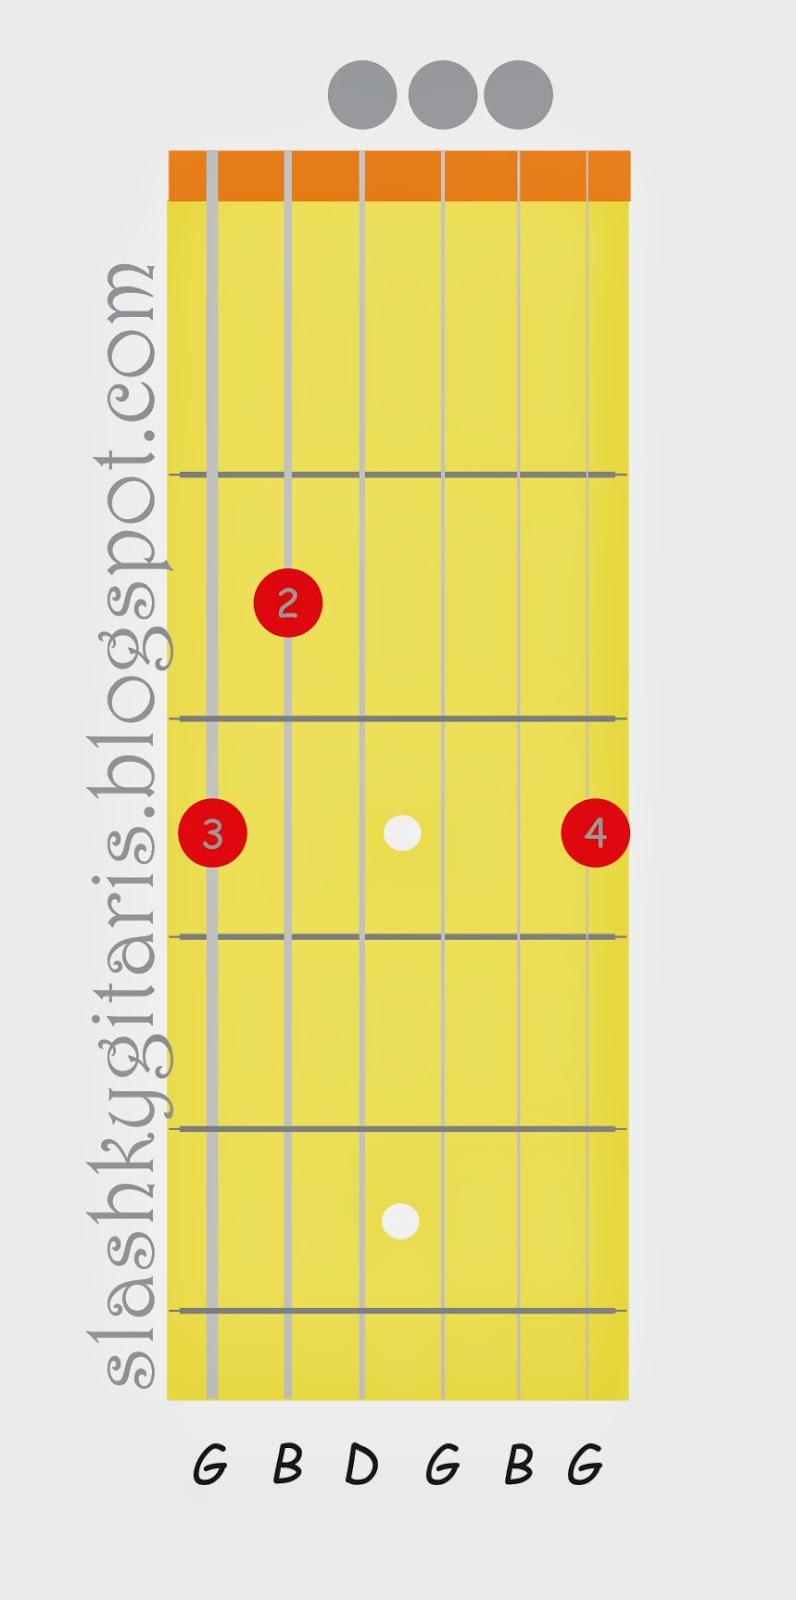 belajar chord gitar, belajar gitar, belajar gitar pemula, belajar kunci gitar, kunci G mayor, kunci gitar,